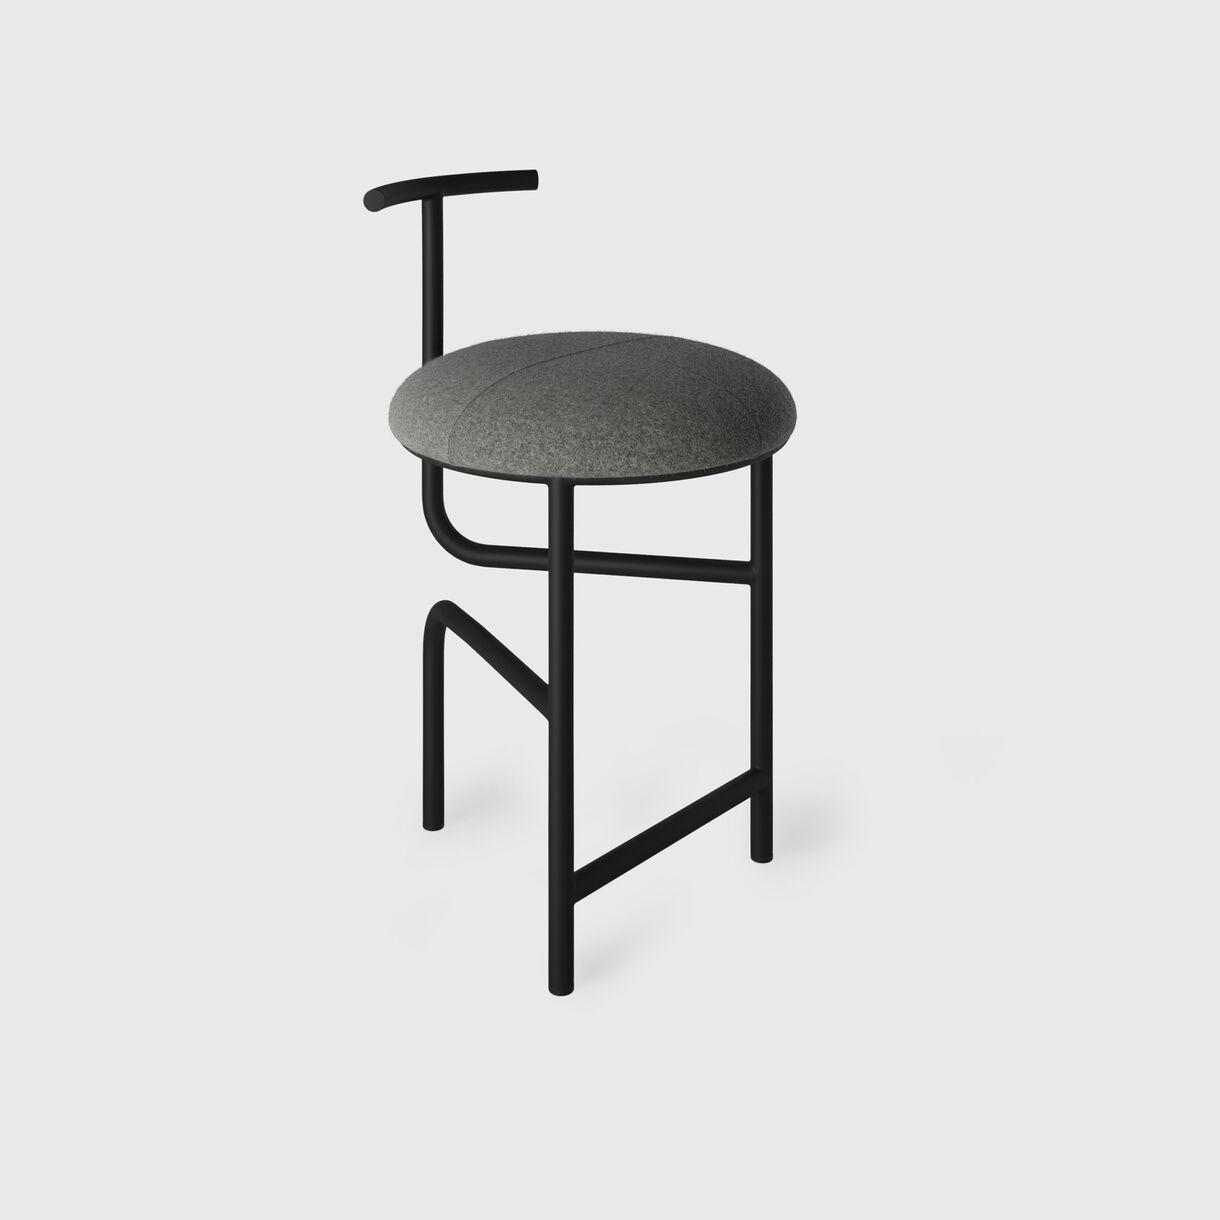 Blend Chair, Upholstered